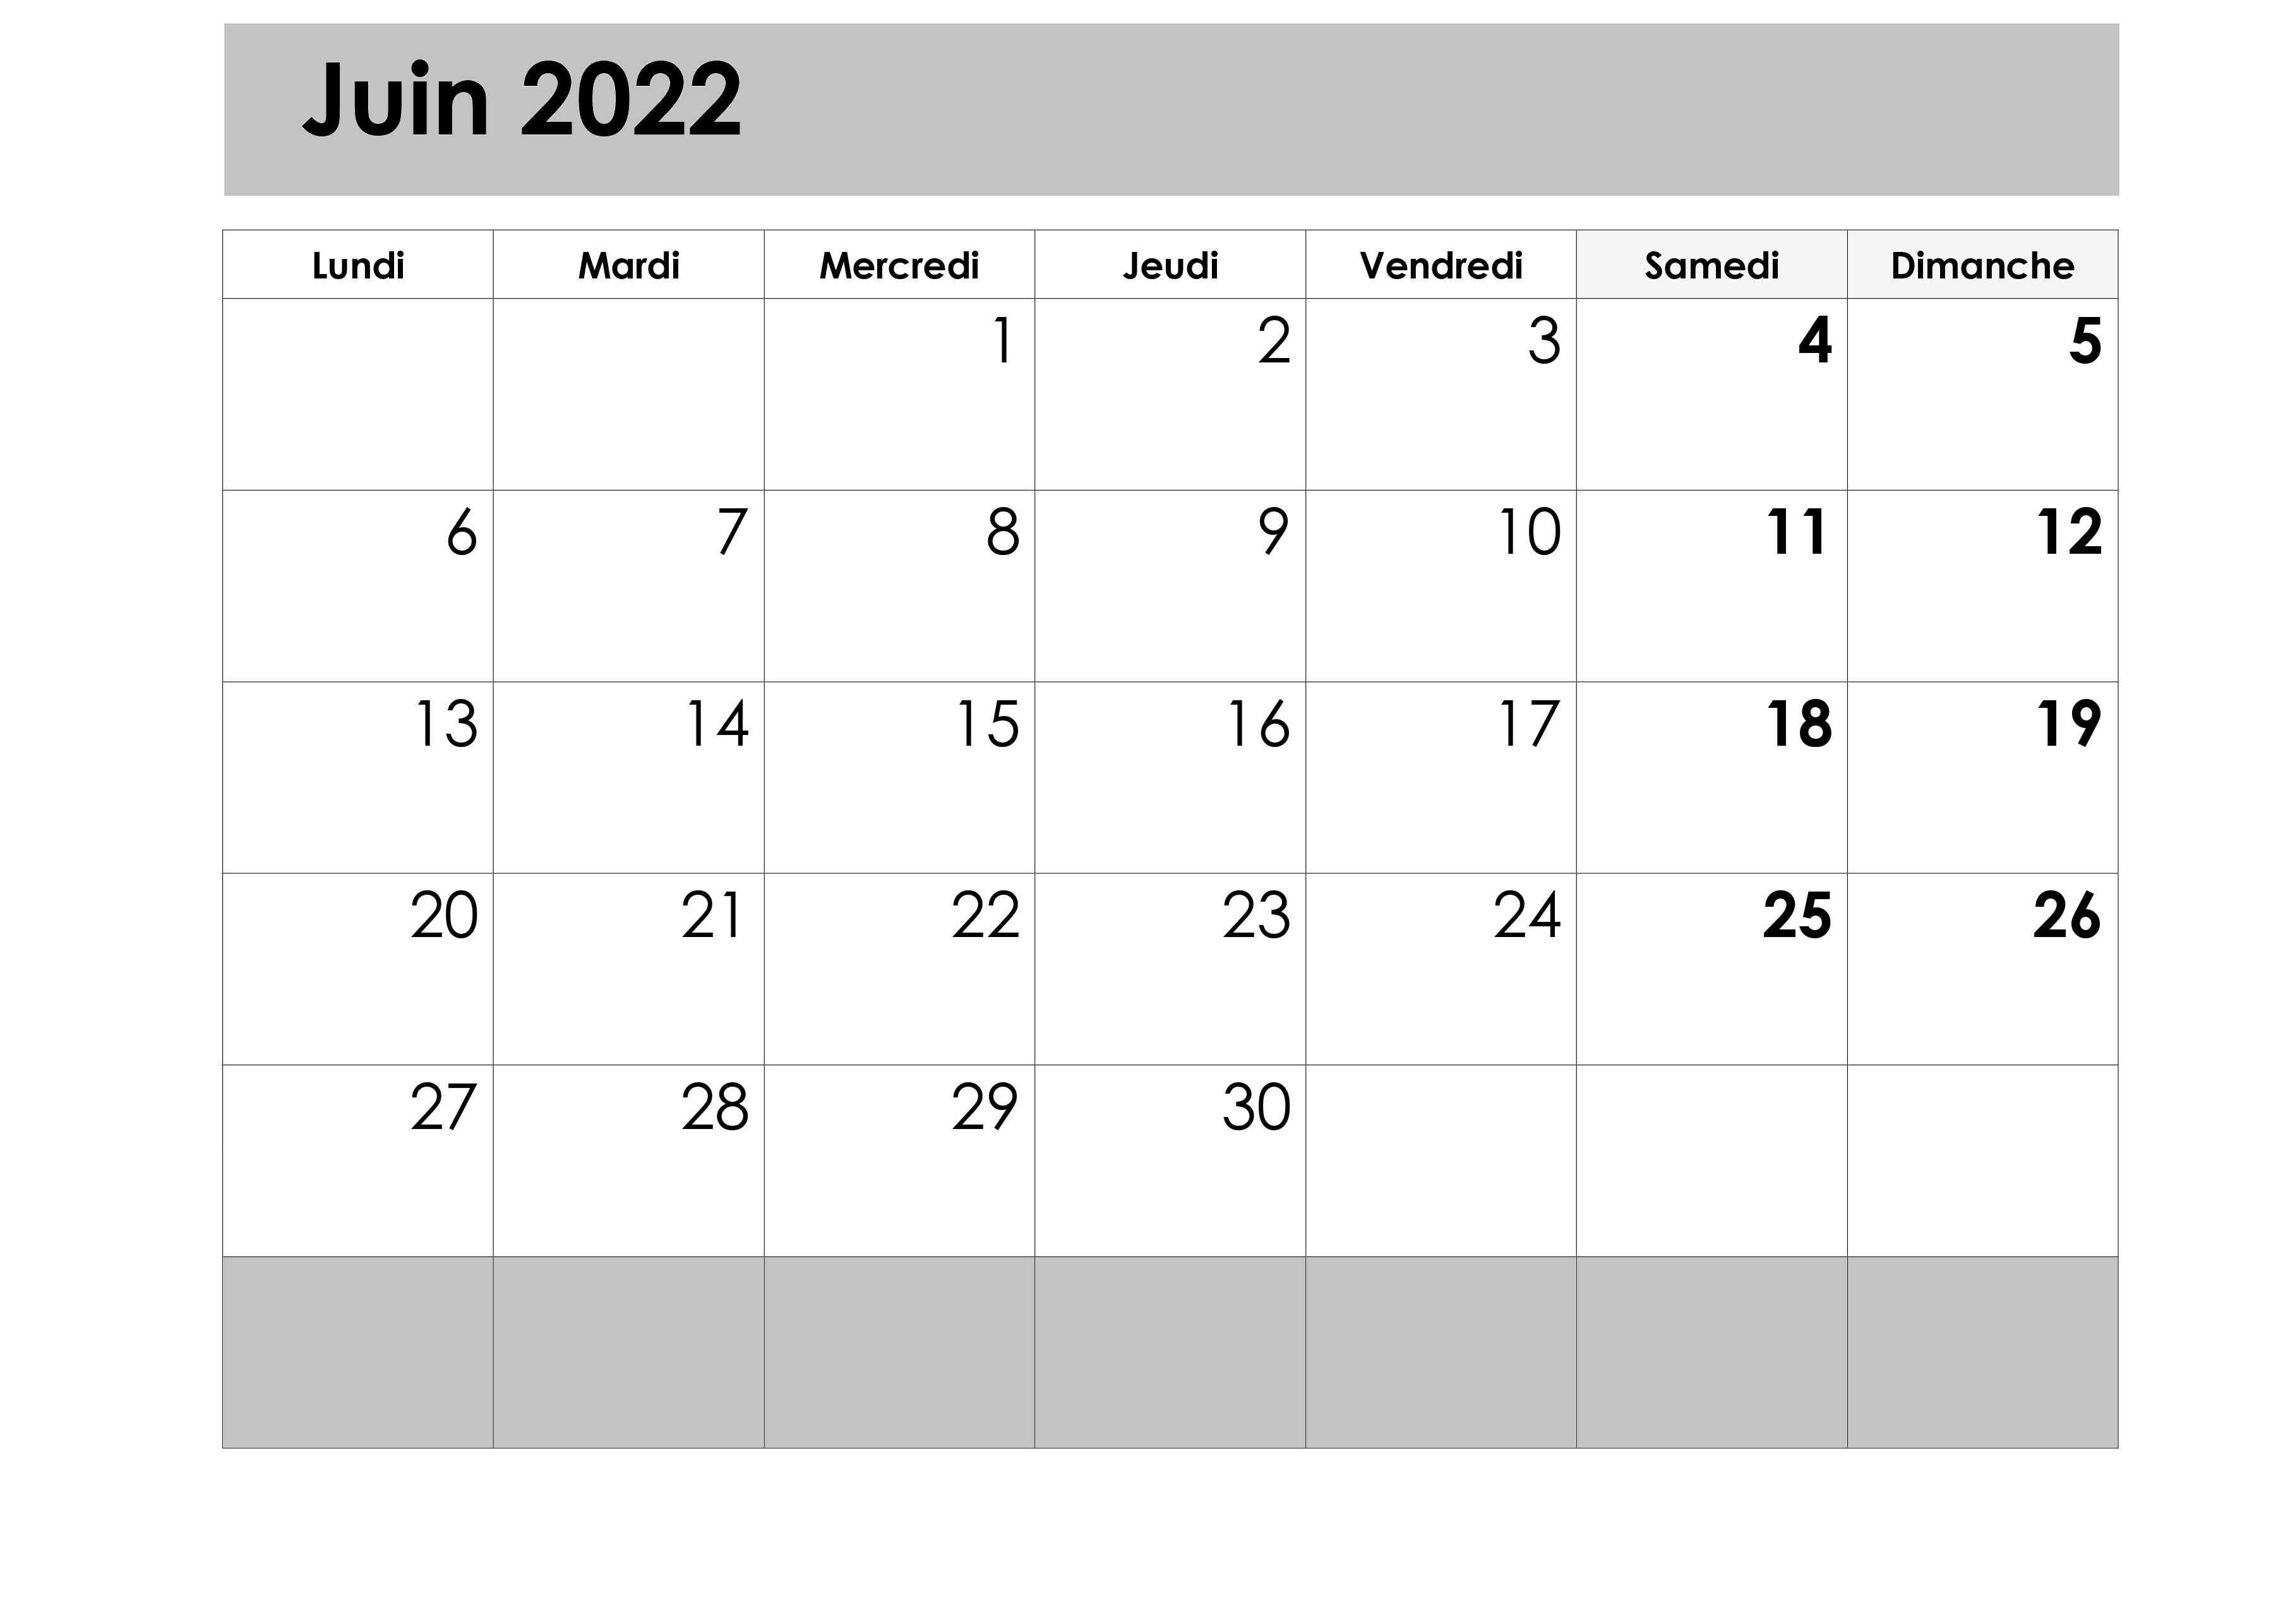 Juin 2022 Calendrier